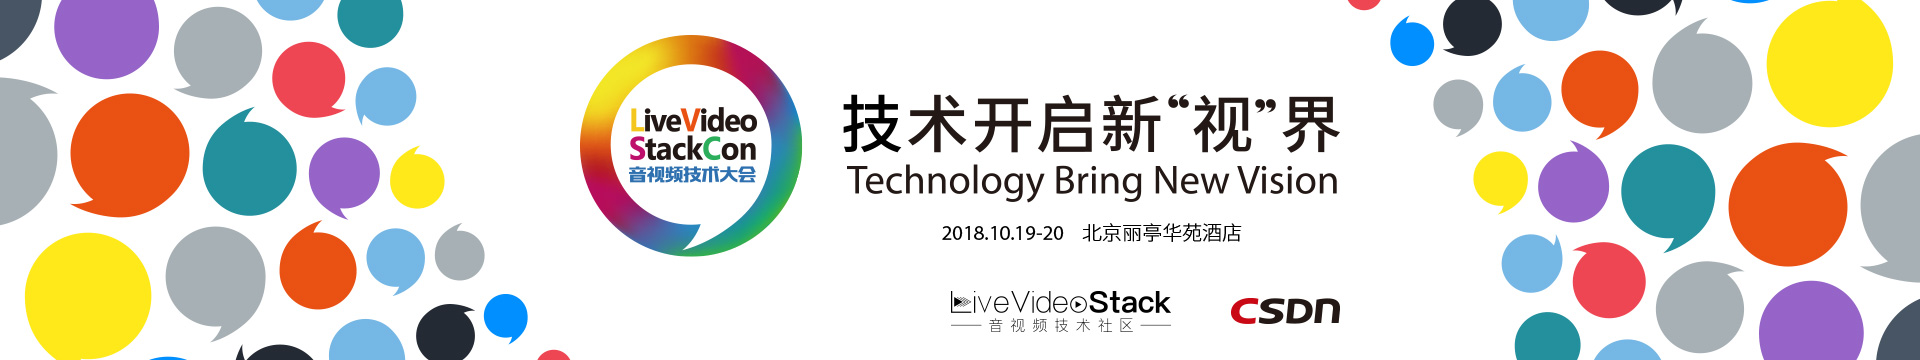 LiveVideoStackCon 2018音视频技术大会